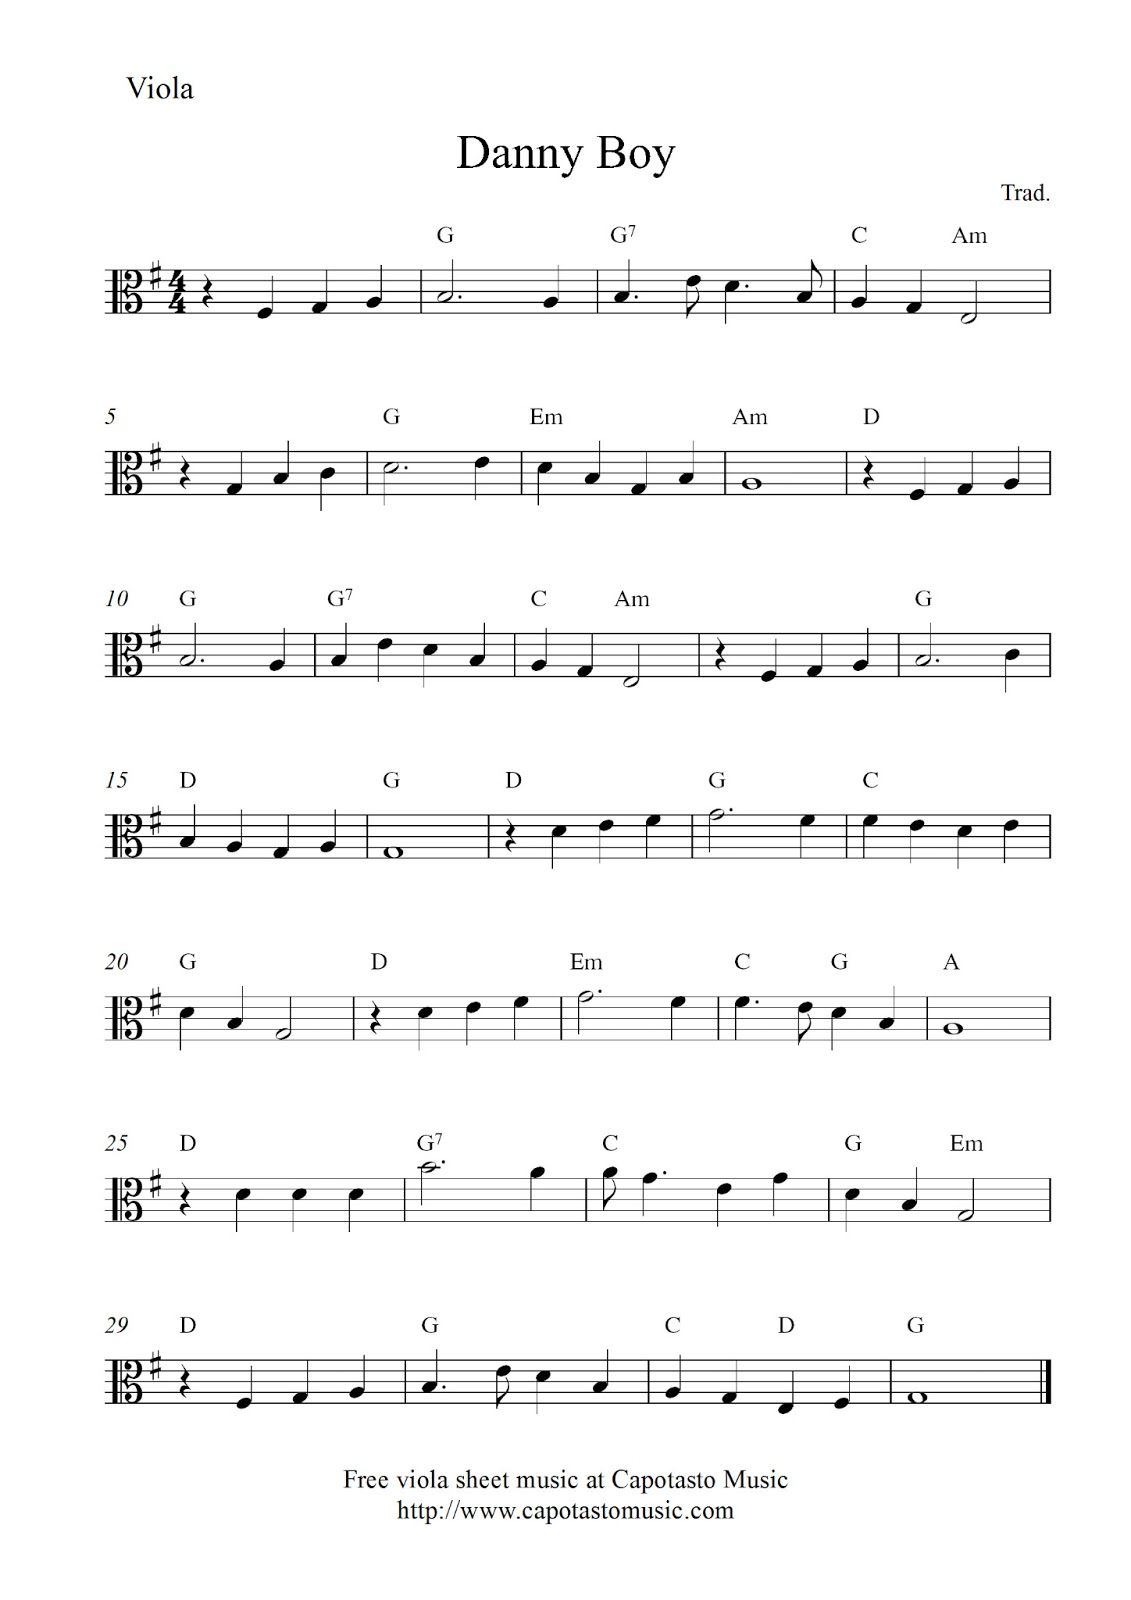 Free Viola Sheet Music Score, Danny Boy - Viola Sheet Music Free Printable